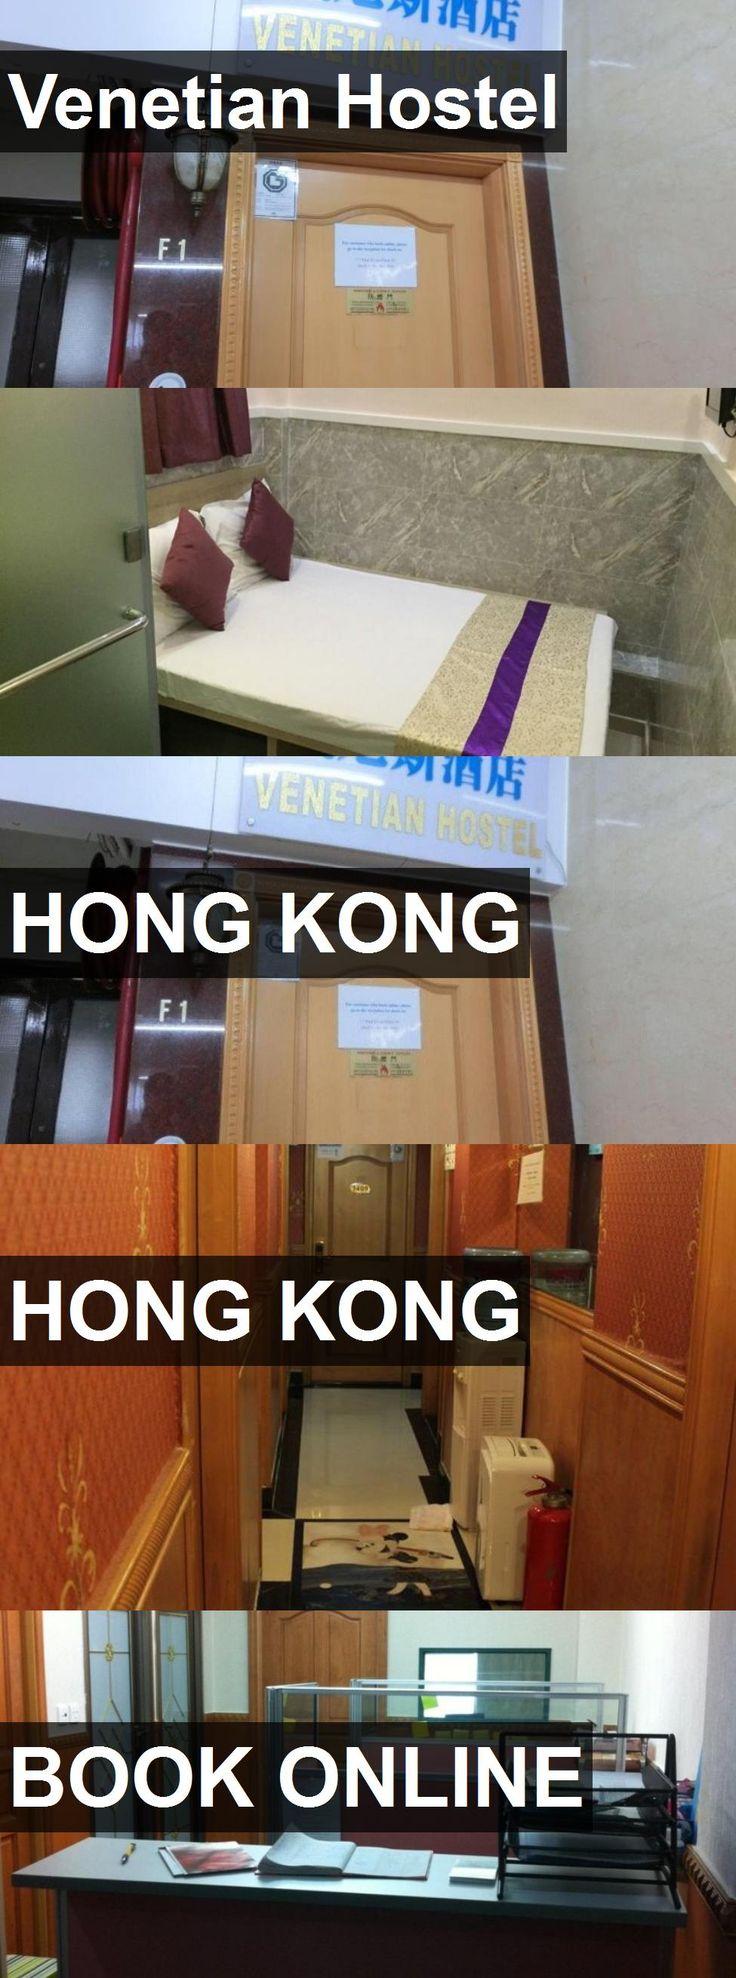 Venetian Hostel in Hong Kong, Hong Kong. For more information, photos, reviews and best prices please follow the link. #HongKong #HongKong #travel #vacation #hostel